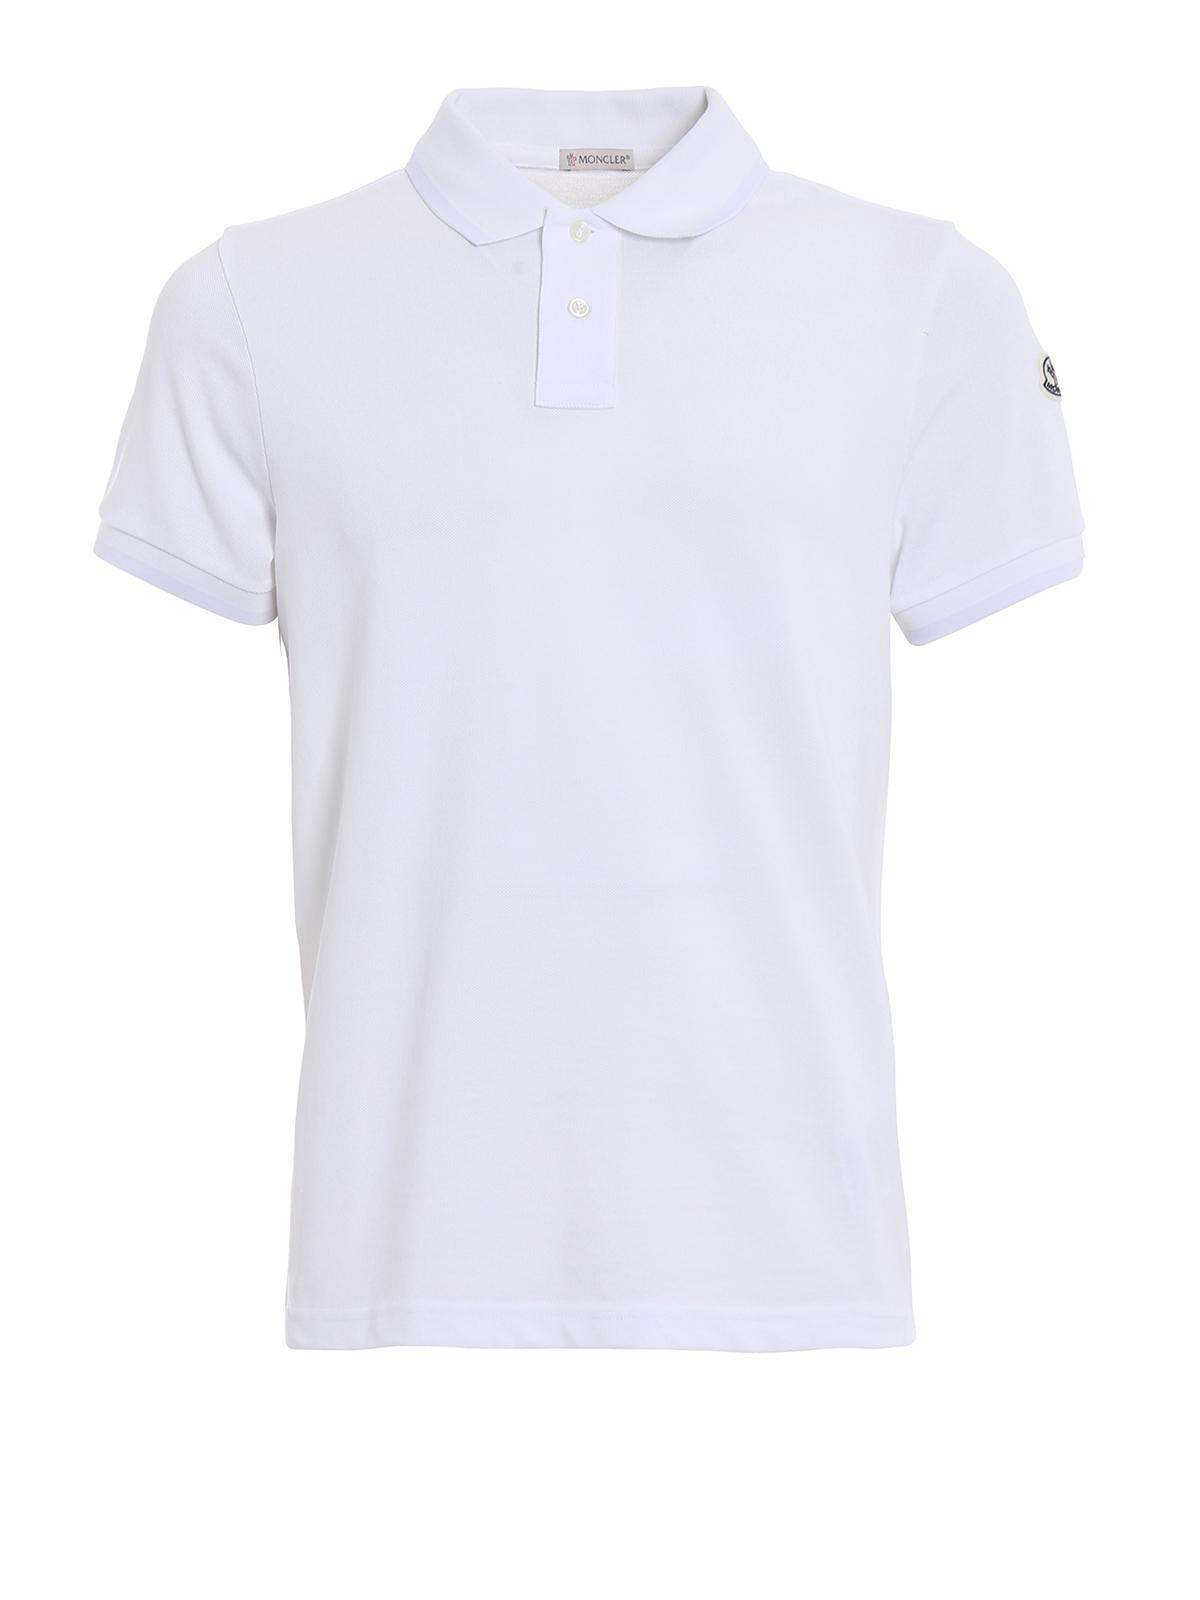 Moncler - Polo - Blanc - Polos - D10918304684556 001   iKRIX.com 17a7543a076